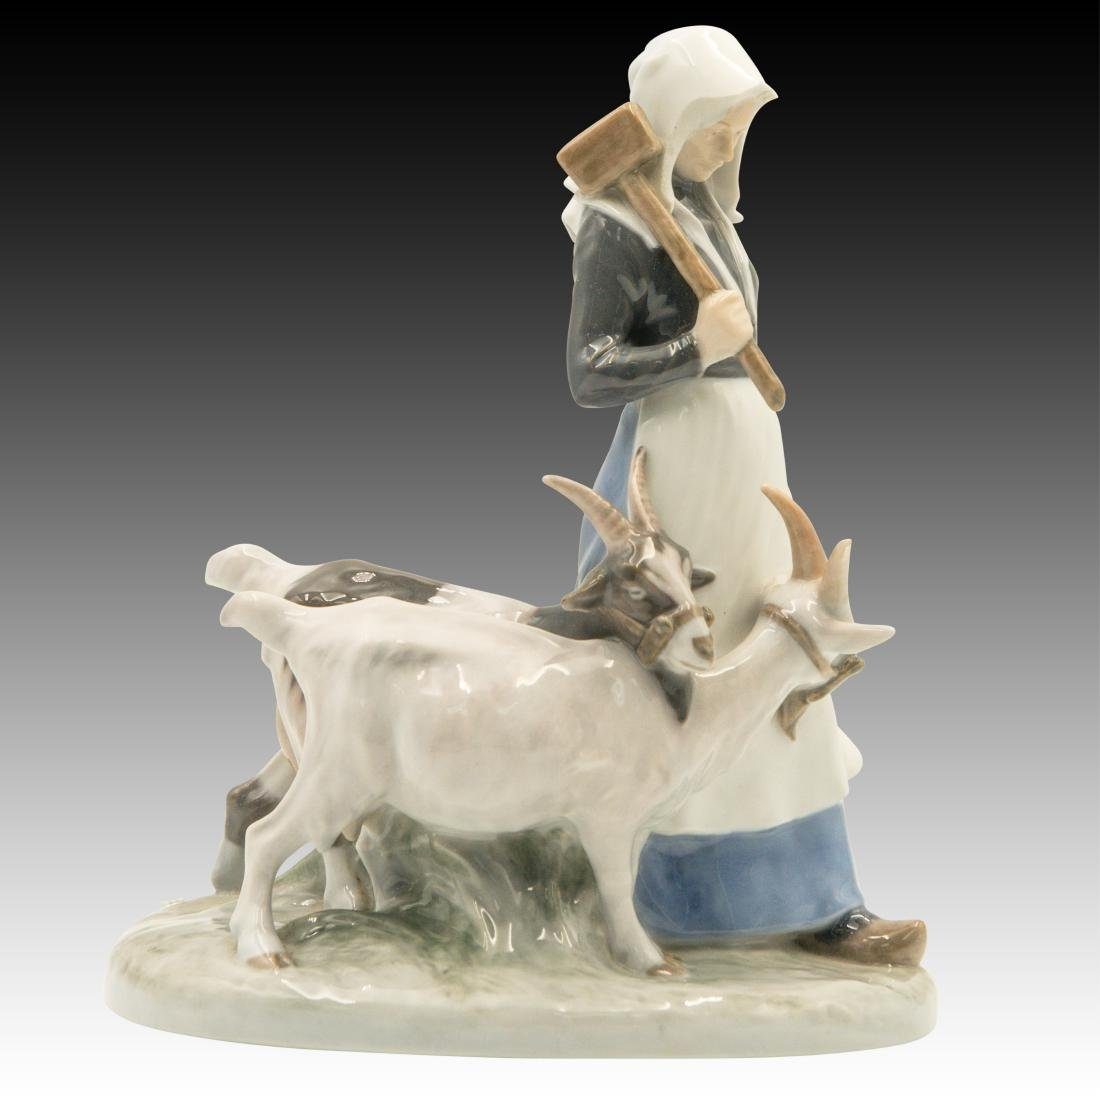 Royal Copenhagen Girl with the Goats Figurine